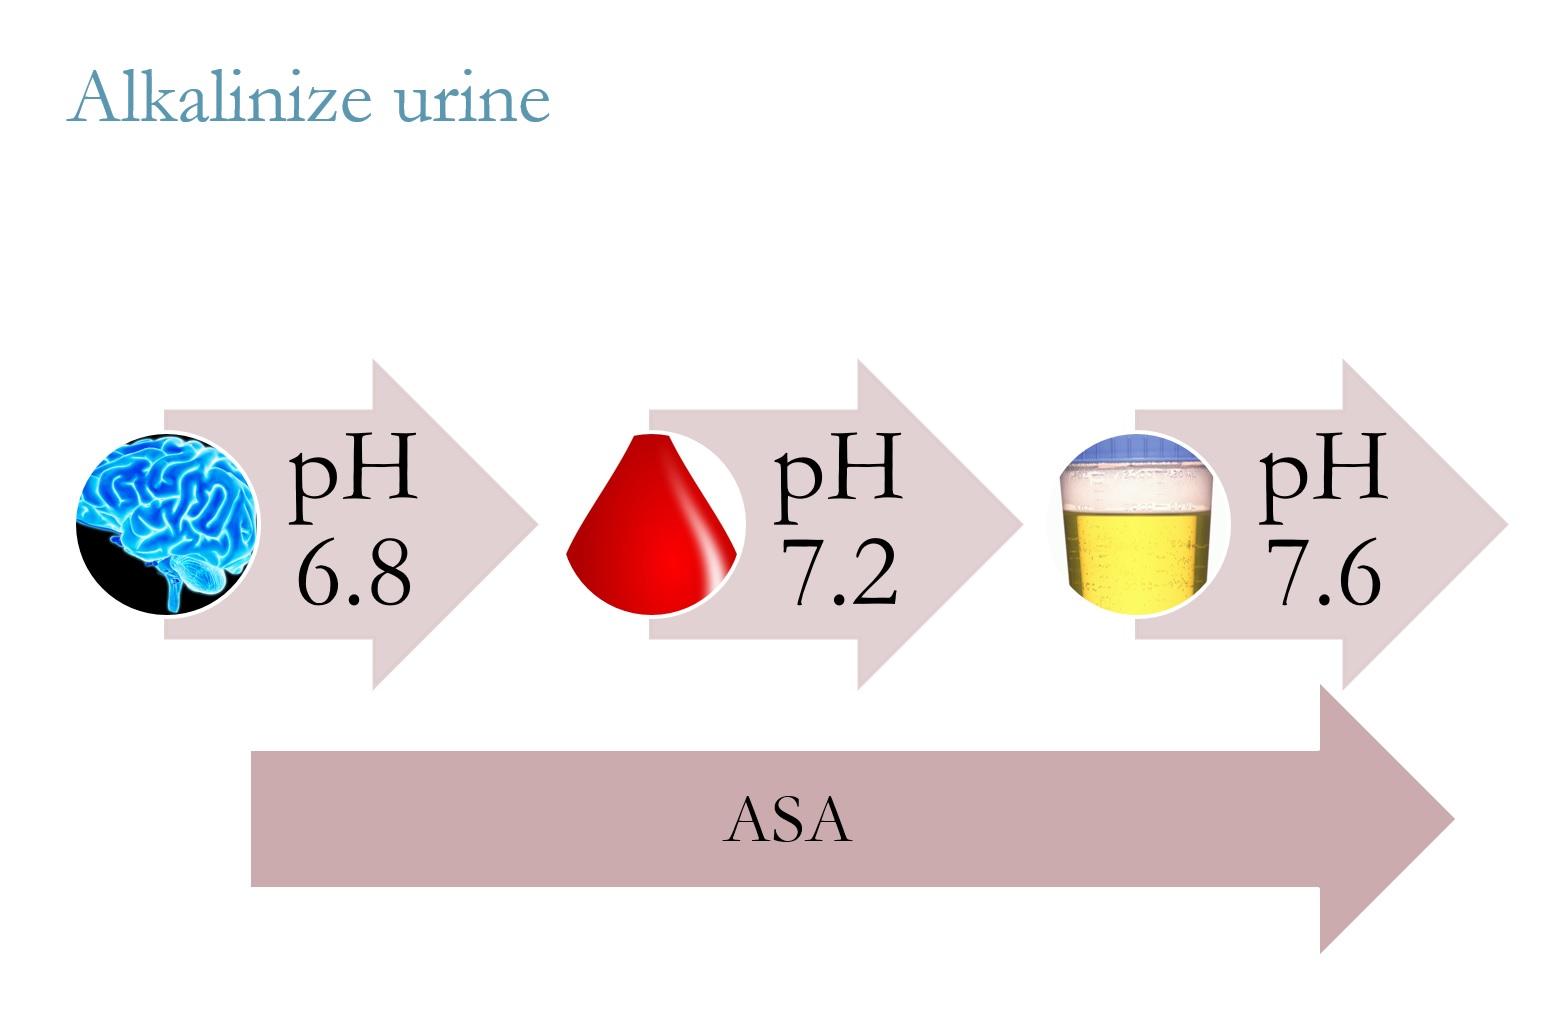 When urine is alkalinized, aspirin gets trapped in urine, setting up concentration gradient decreasing amount in brain (graphic by tammi schaeffer)